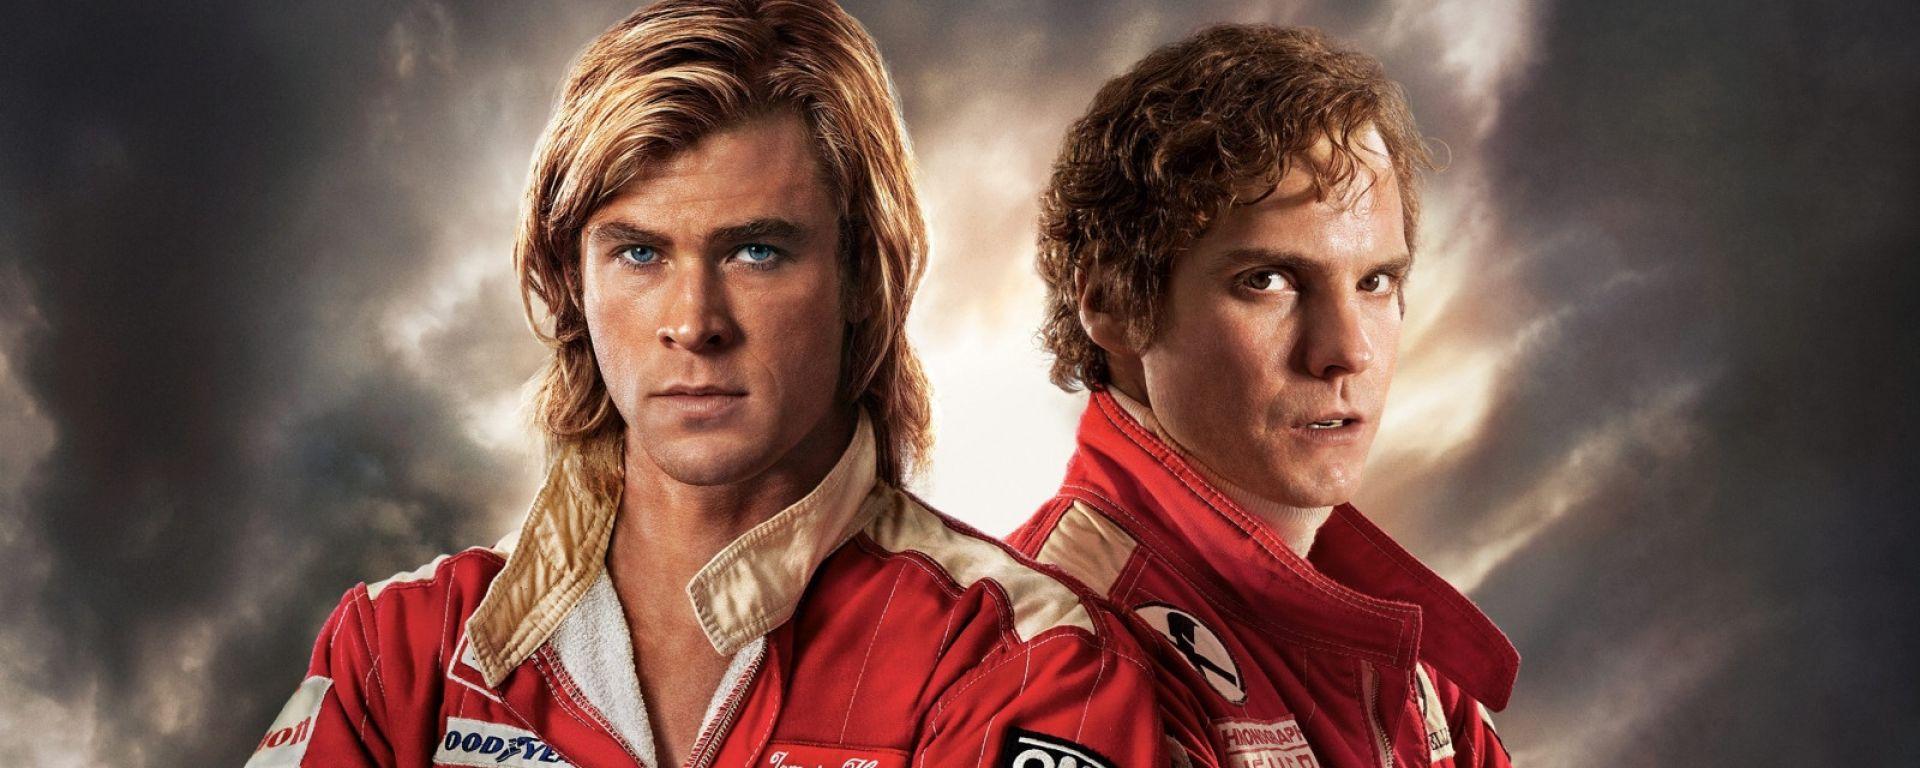 Rush con Chris Hemsworth (James Hunt) e Daniel Bruehl (Niki Lauda)